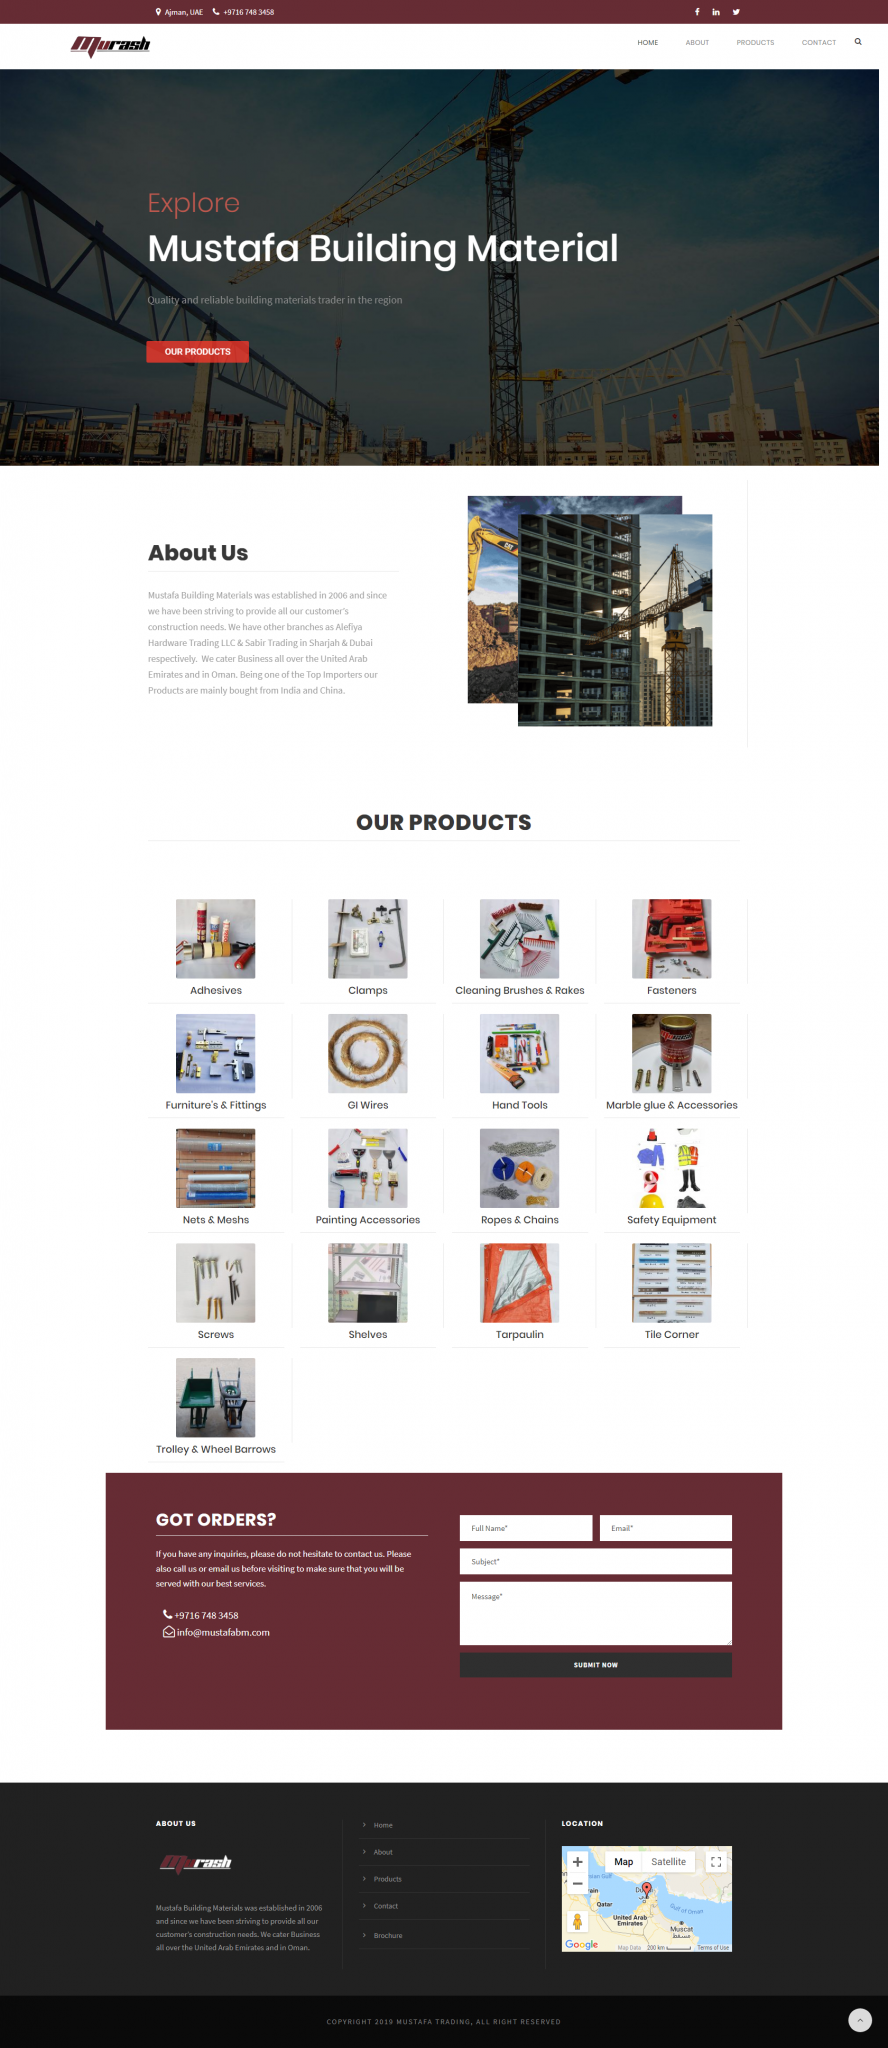 Mustafa Building Material